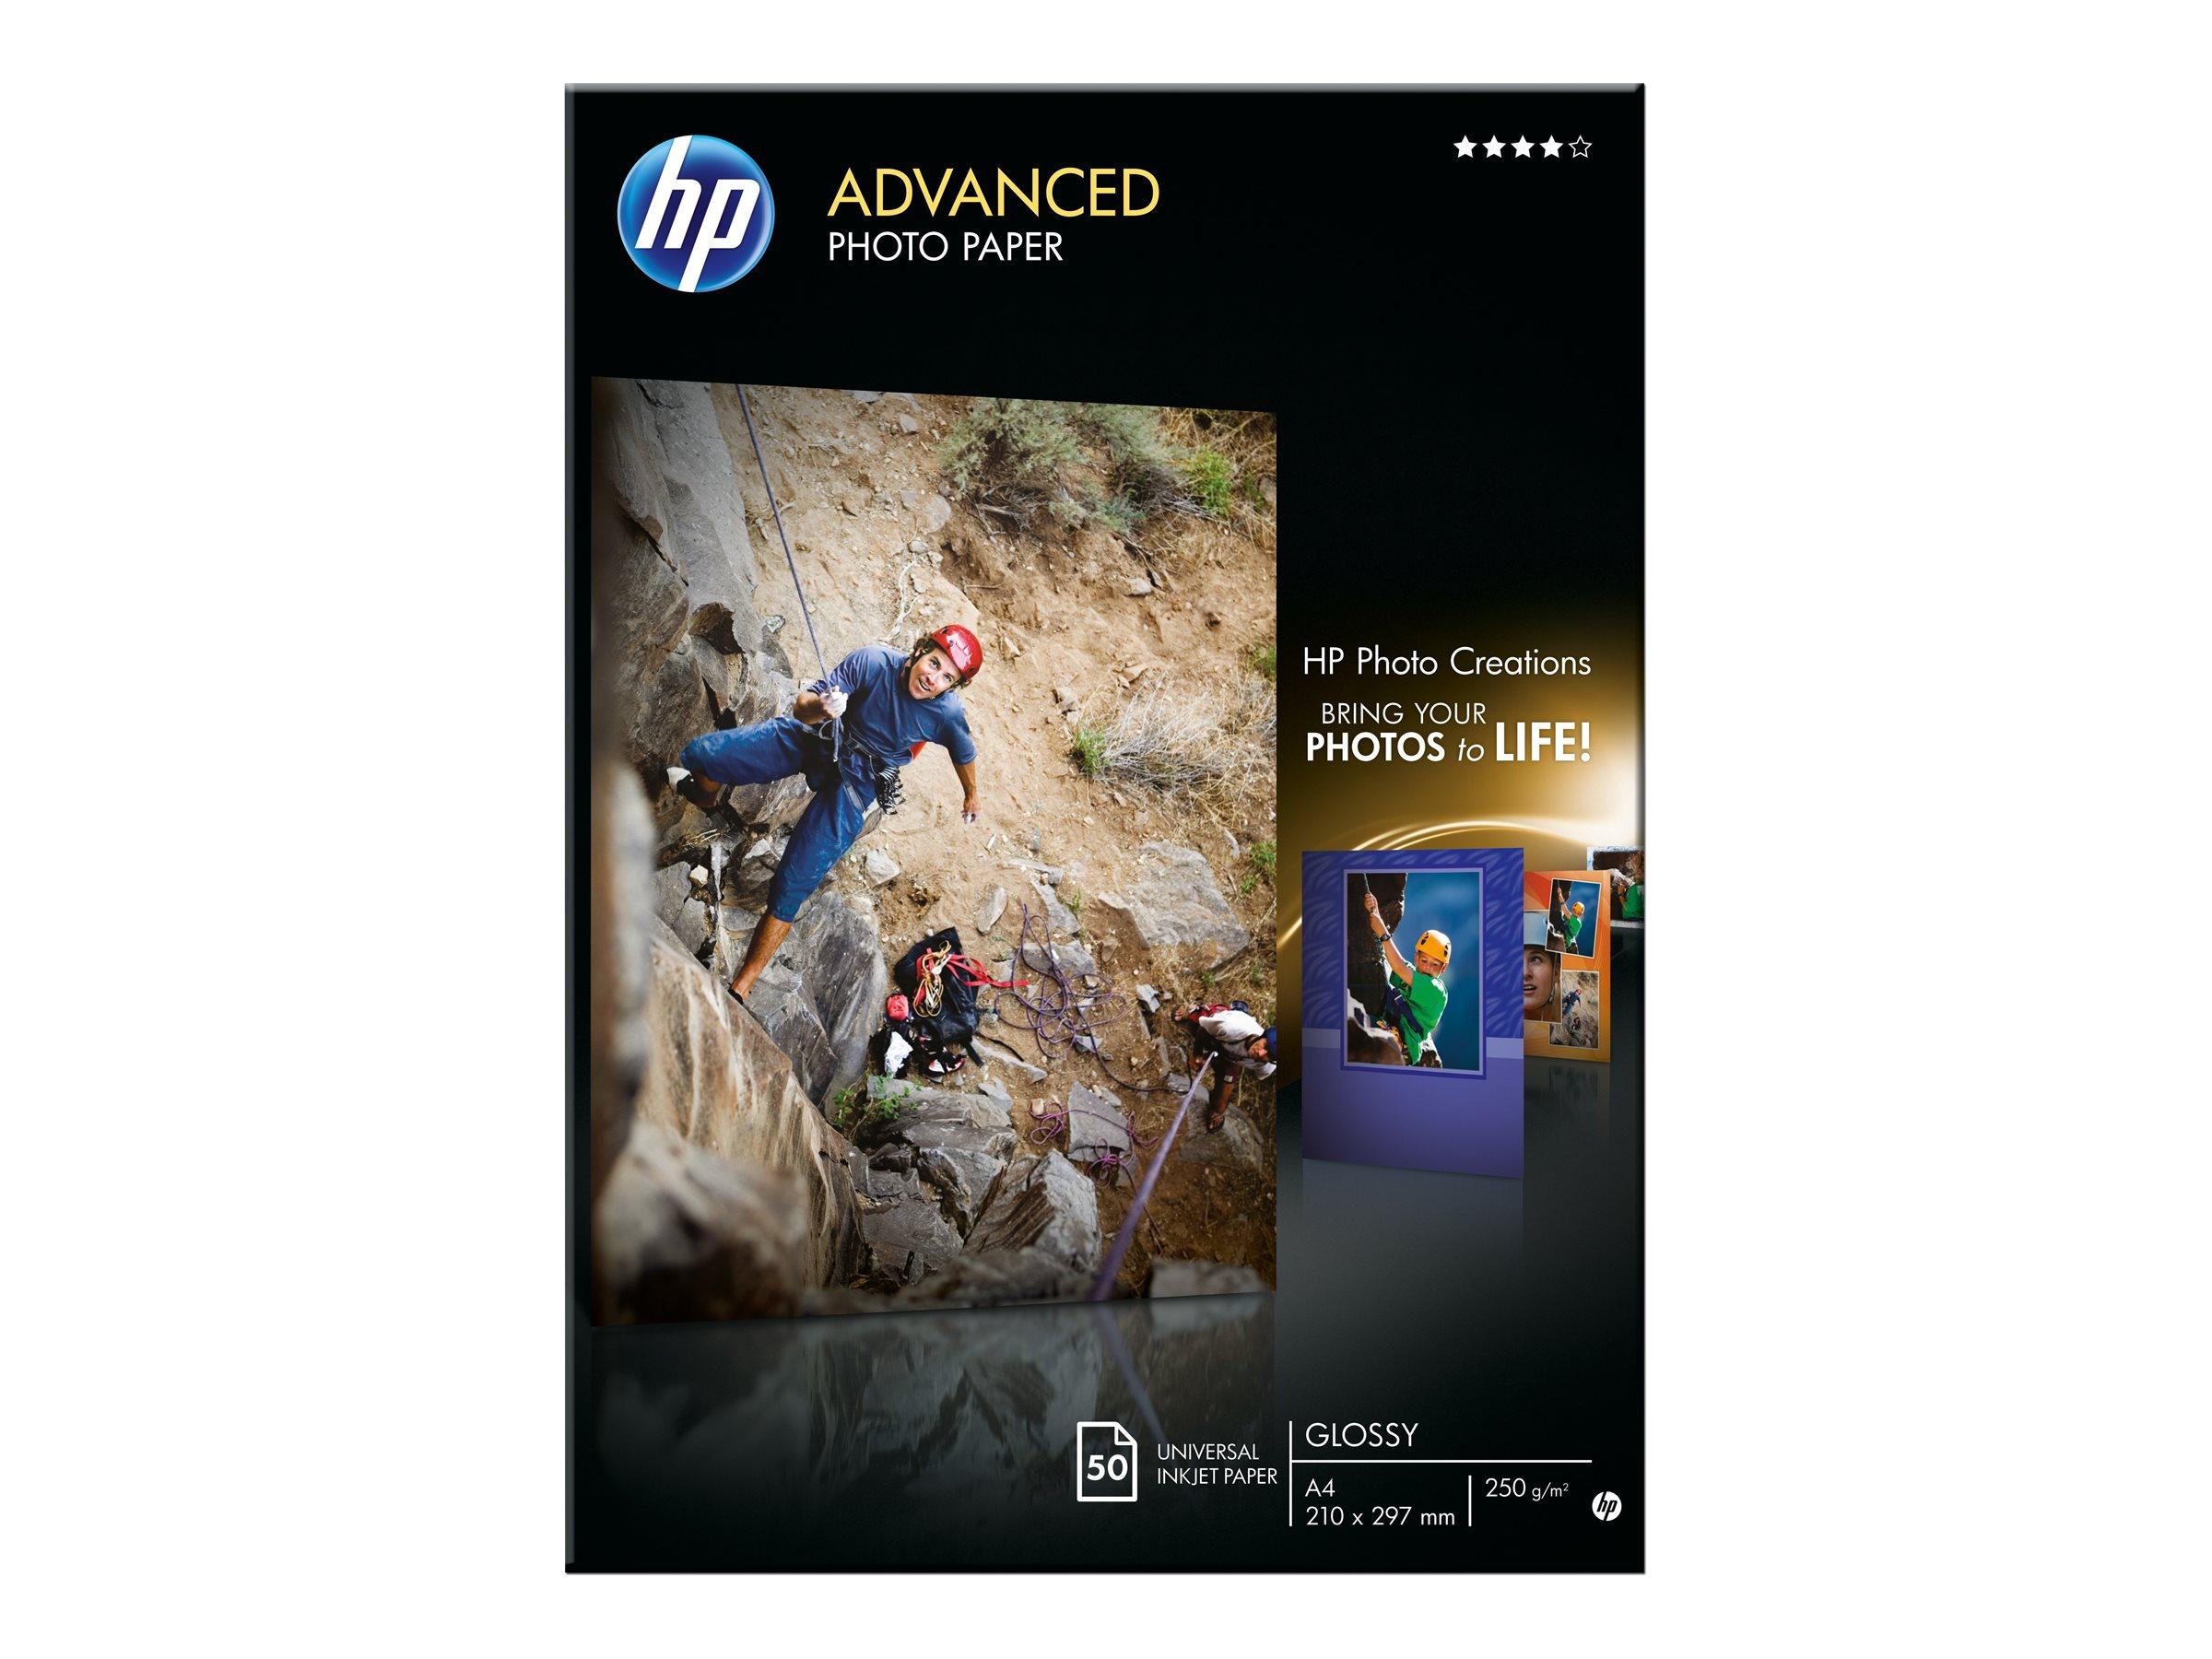 HP Advanced Glossy Photo Paper - Glänzend - A4 (210 x 297 mm) 50 Blatt Fotopapier - für Deskjet 2622; Envy 50XX, 76XX; Officejet